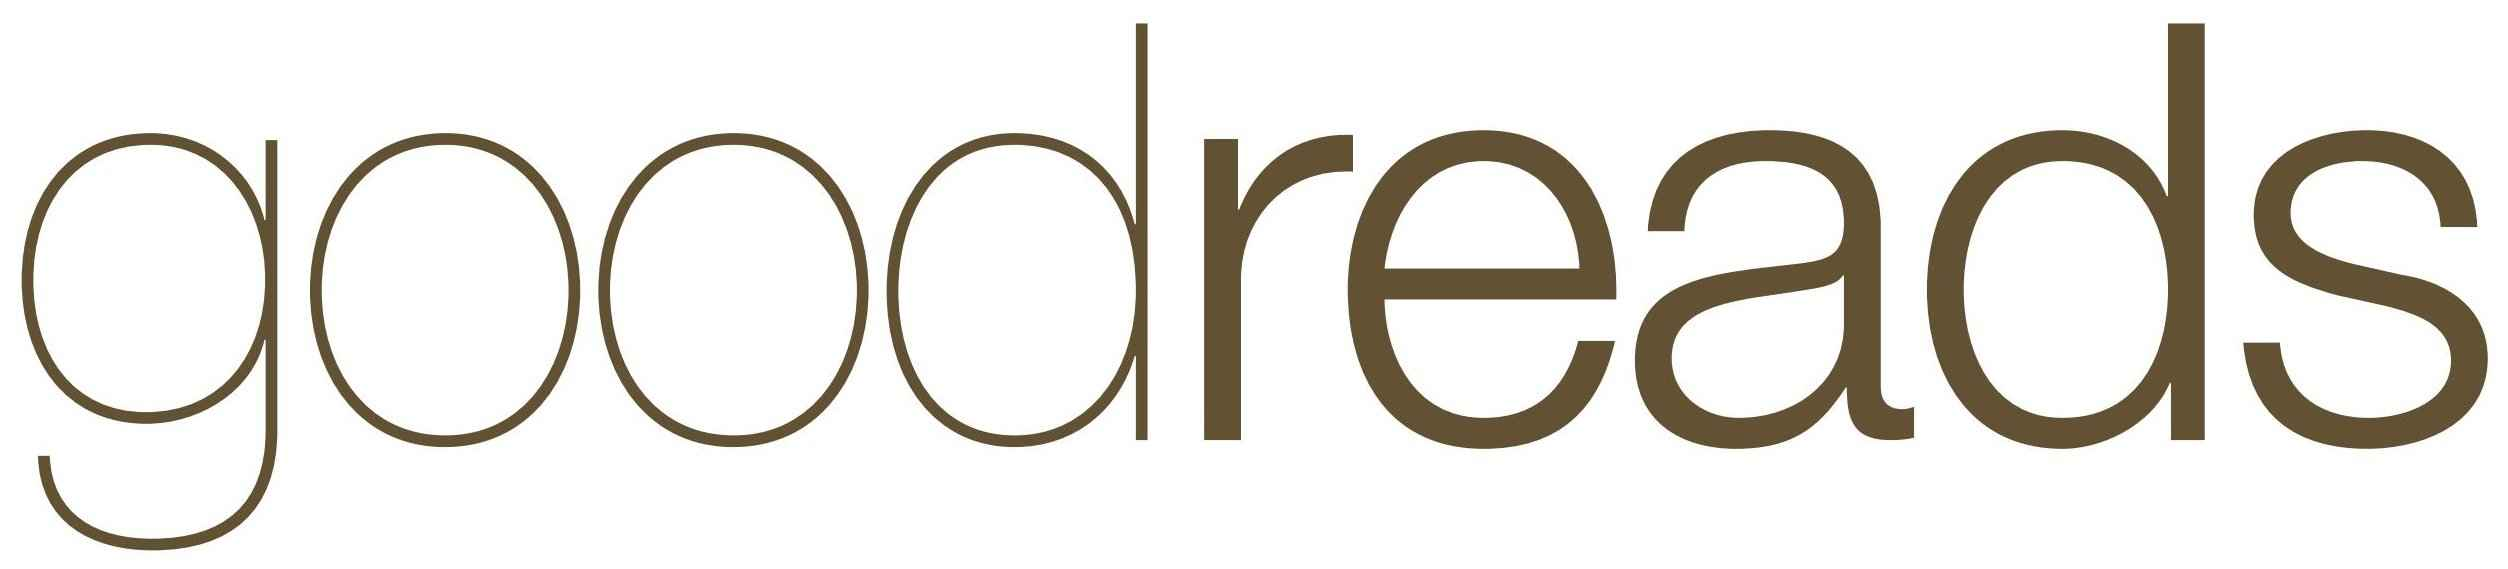 Goodreads Logo [EPS File] png